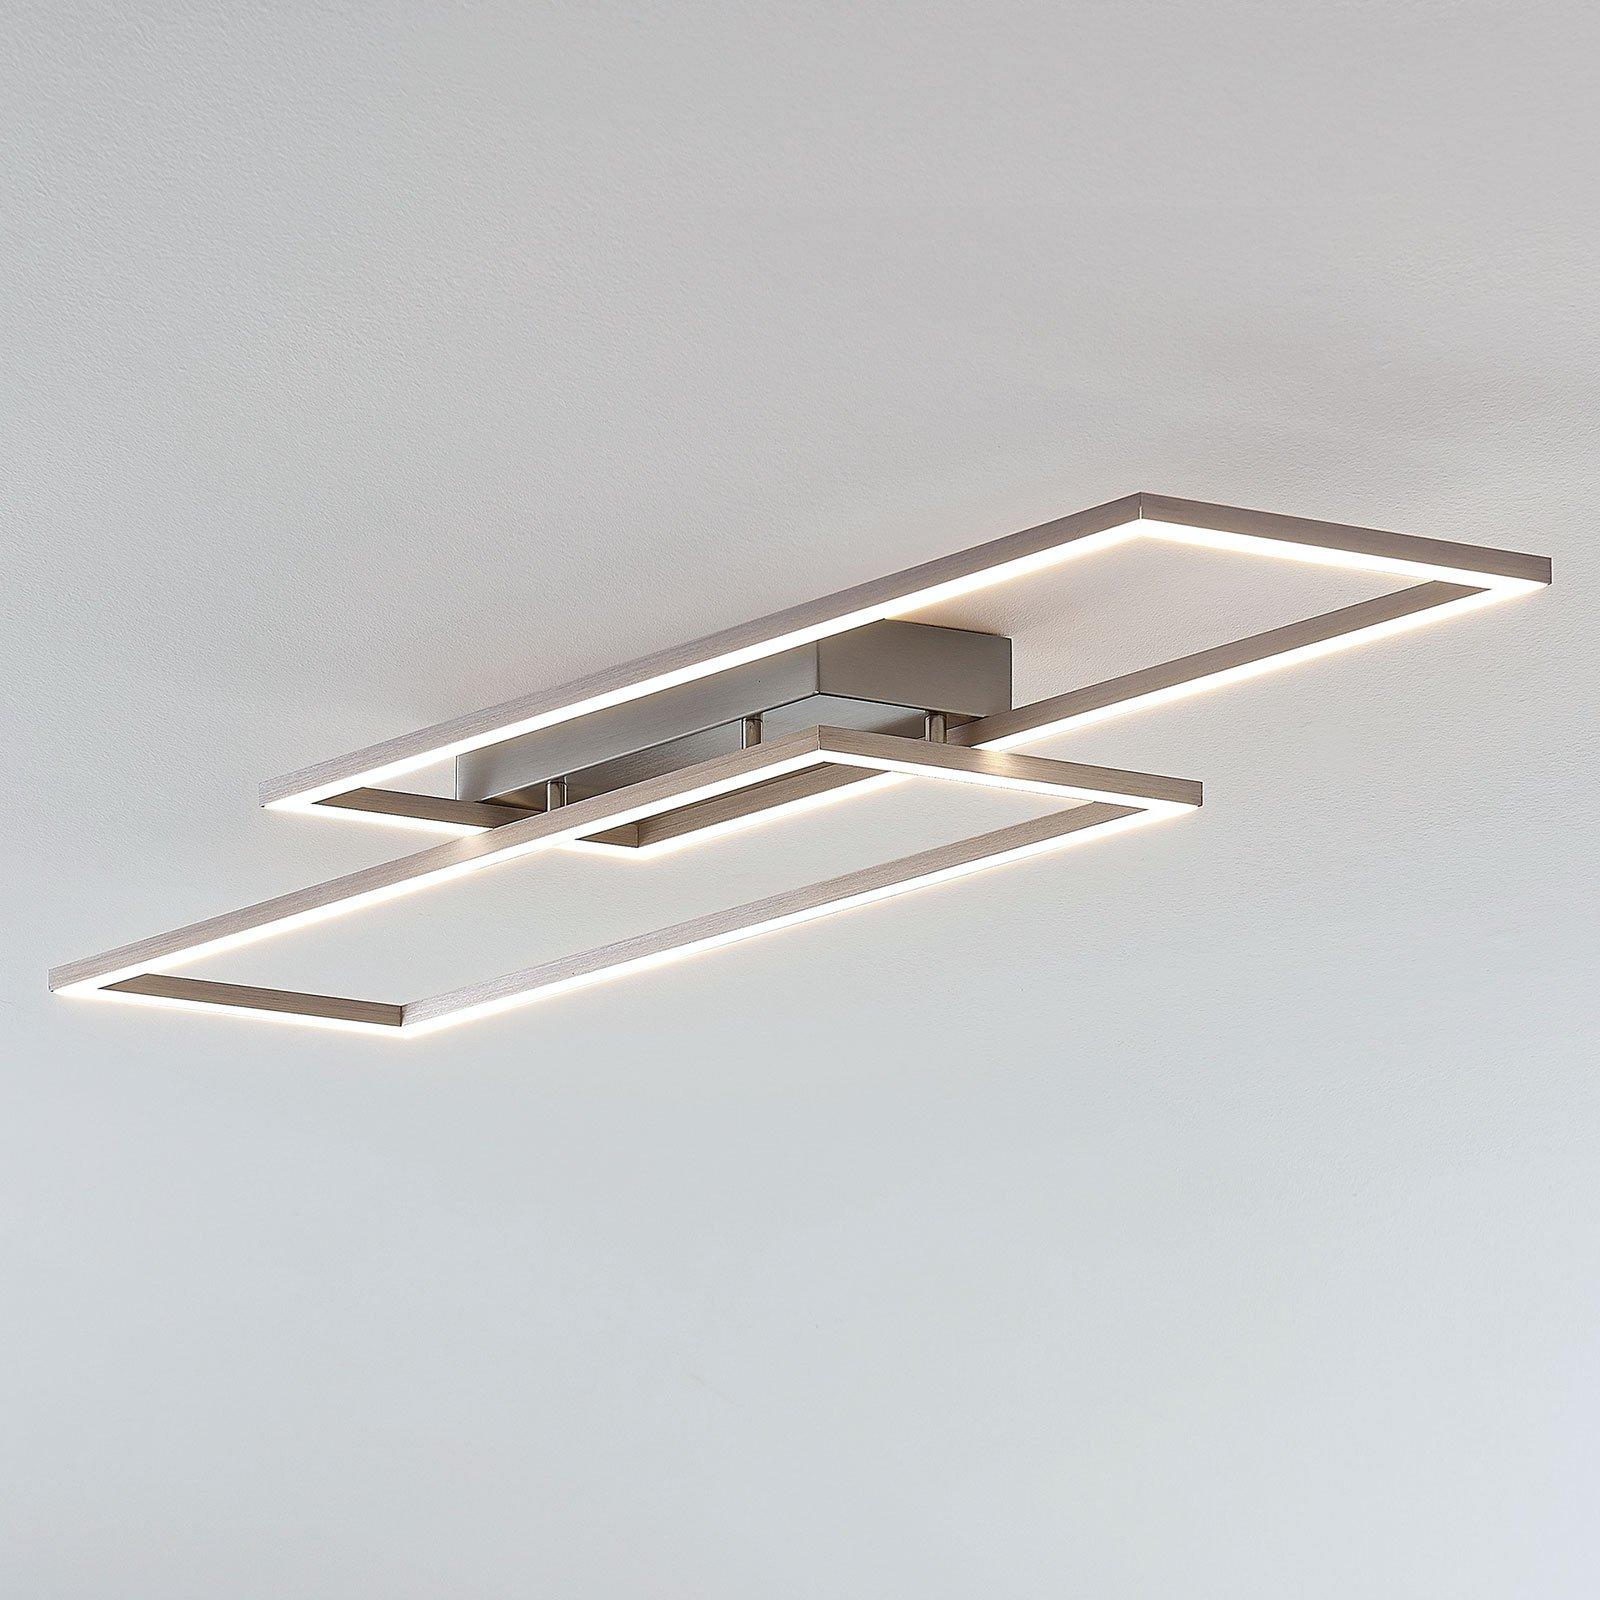 Rammeformet LED-taklampe Quadra, dimbar